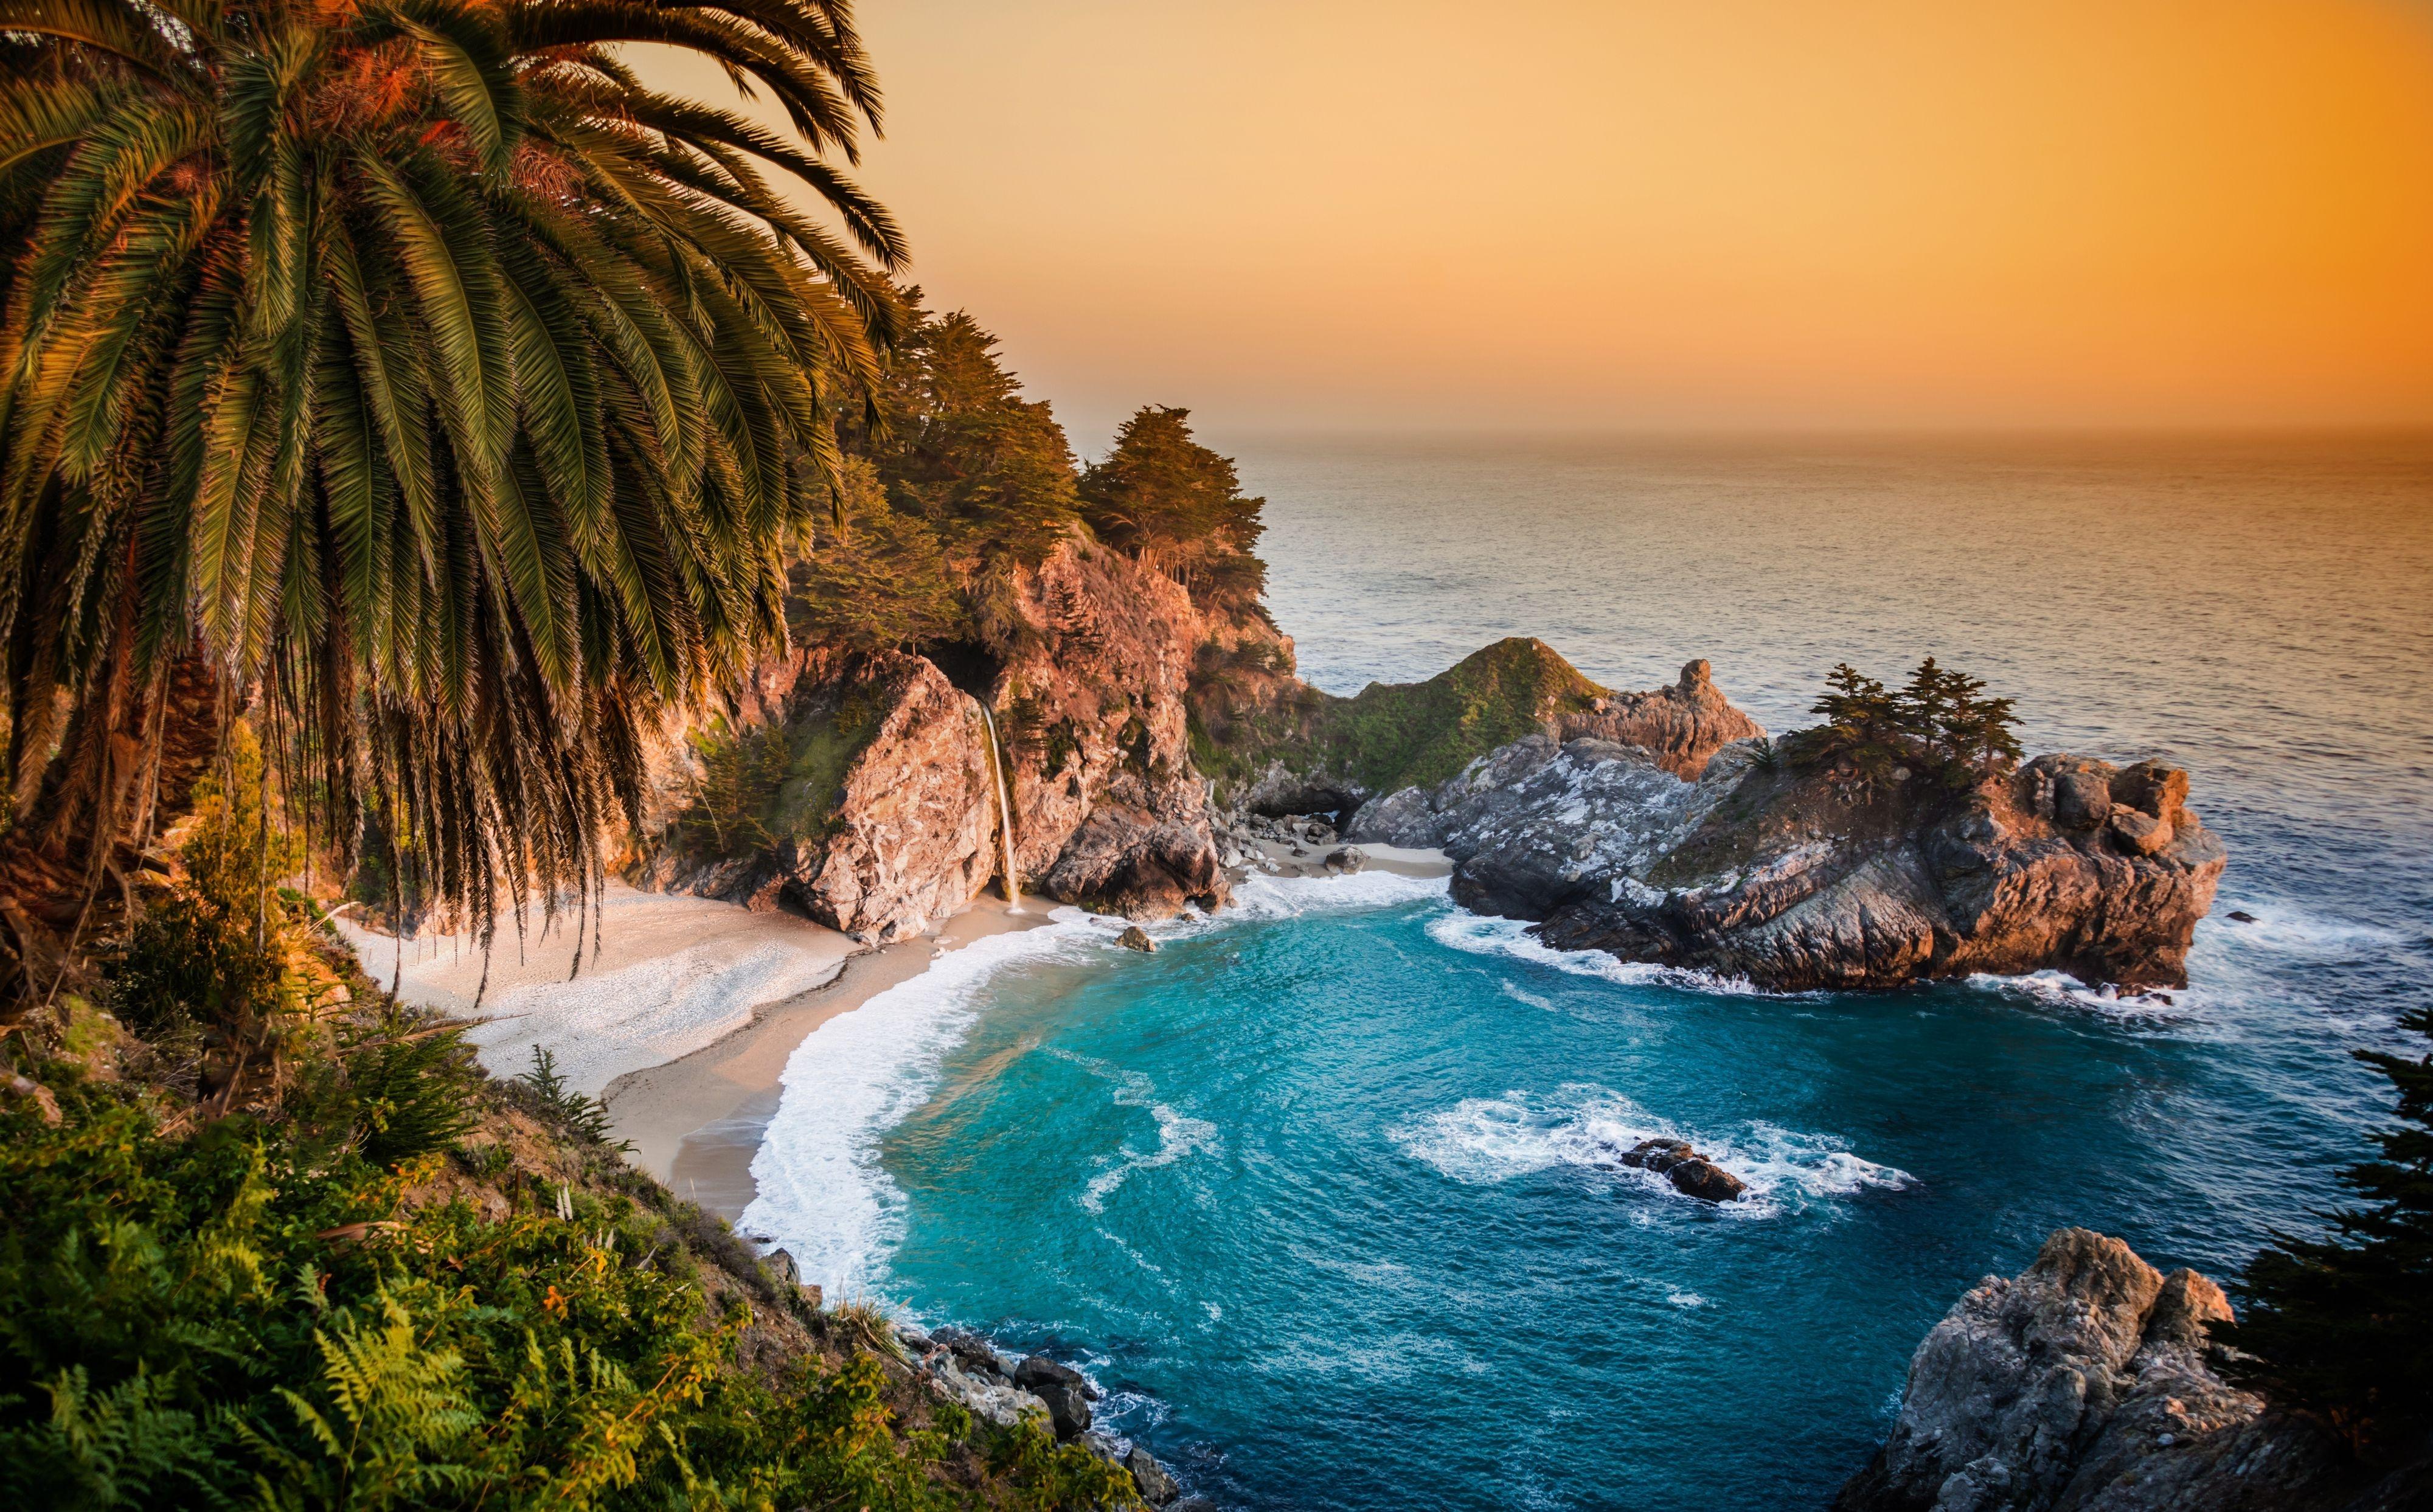 California Pacific Ocean waterfall wallpaper background 4000x2486